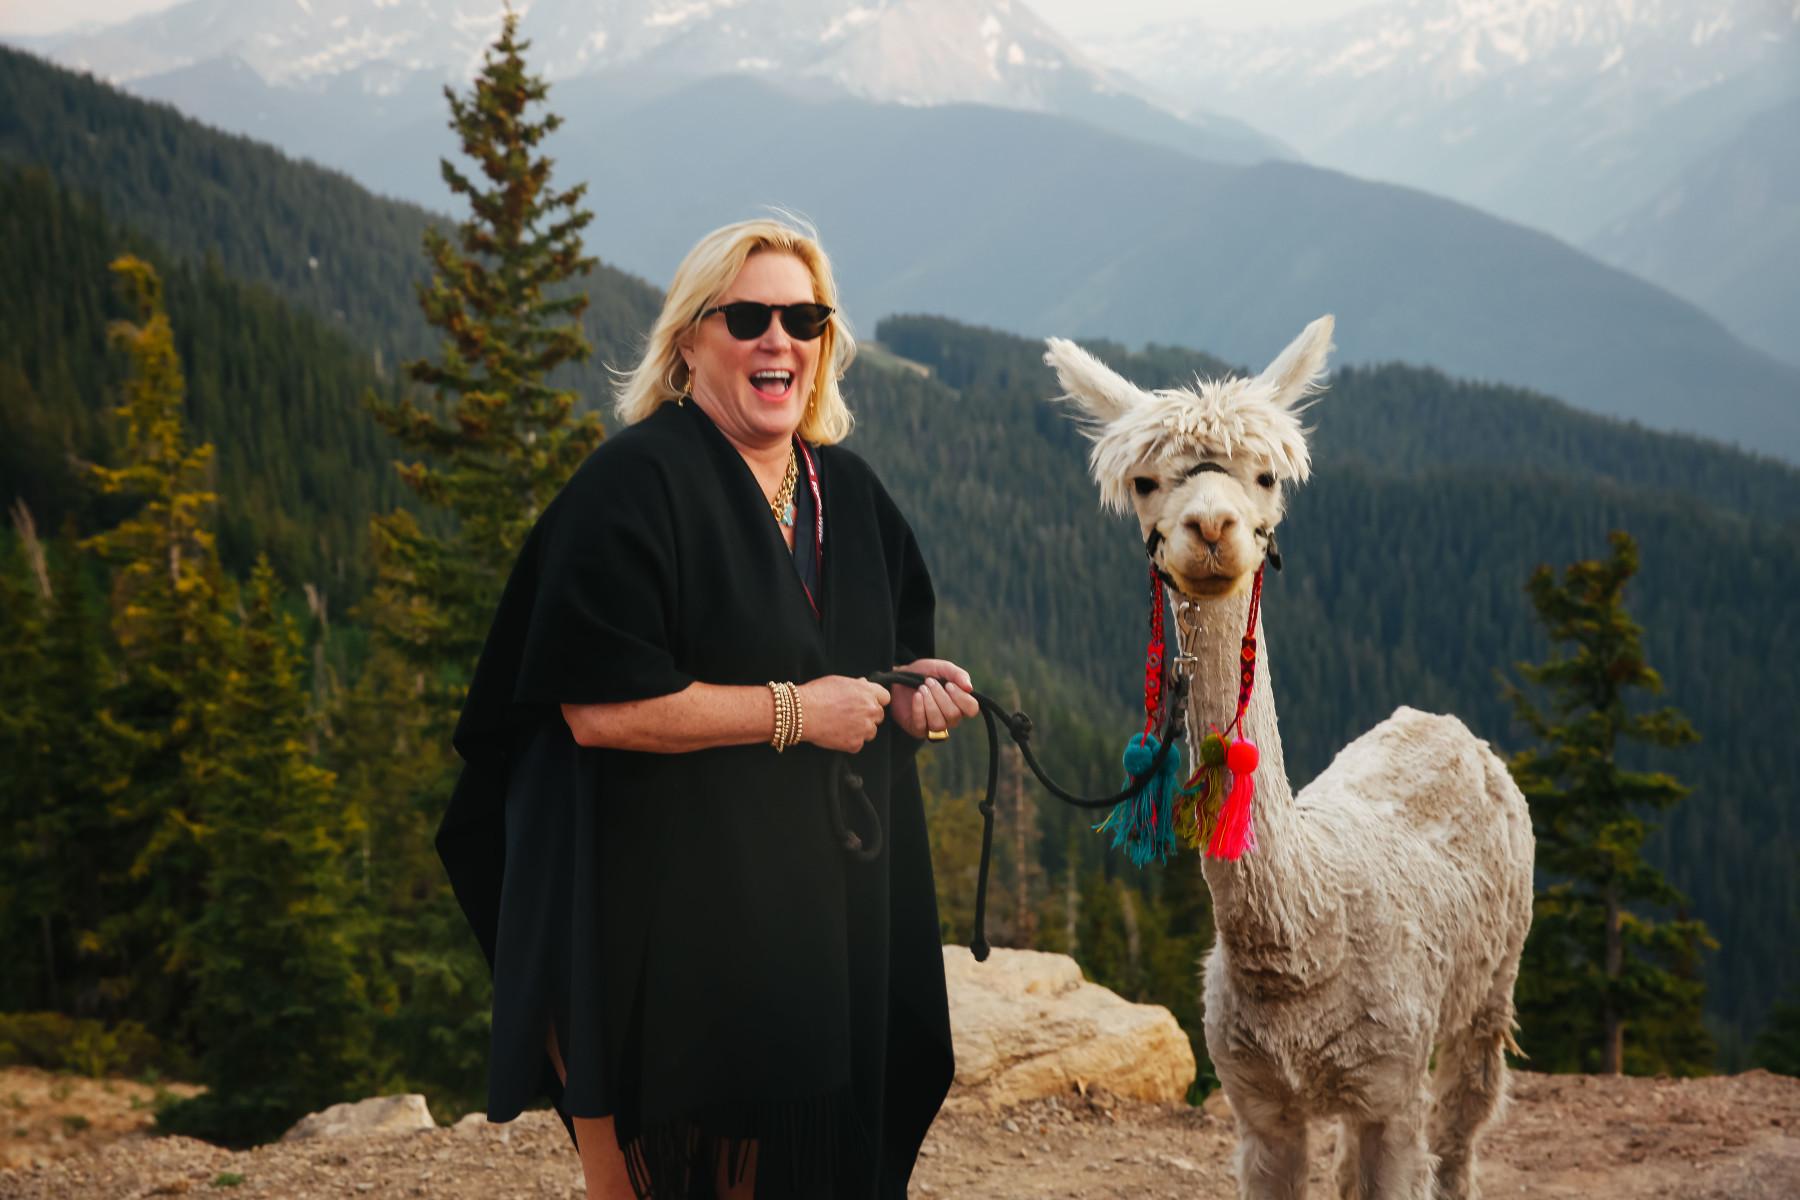 Peru-Aspen-mountaintop-2018-29